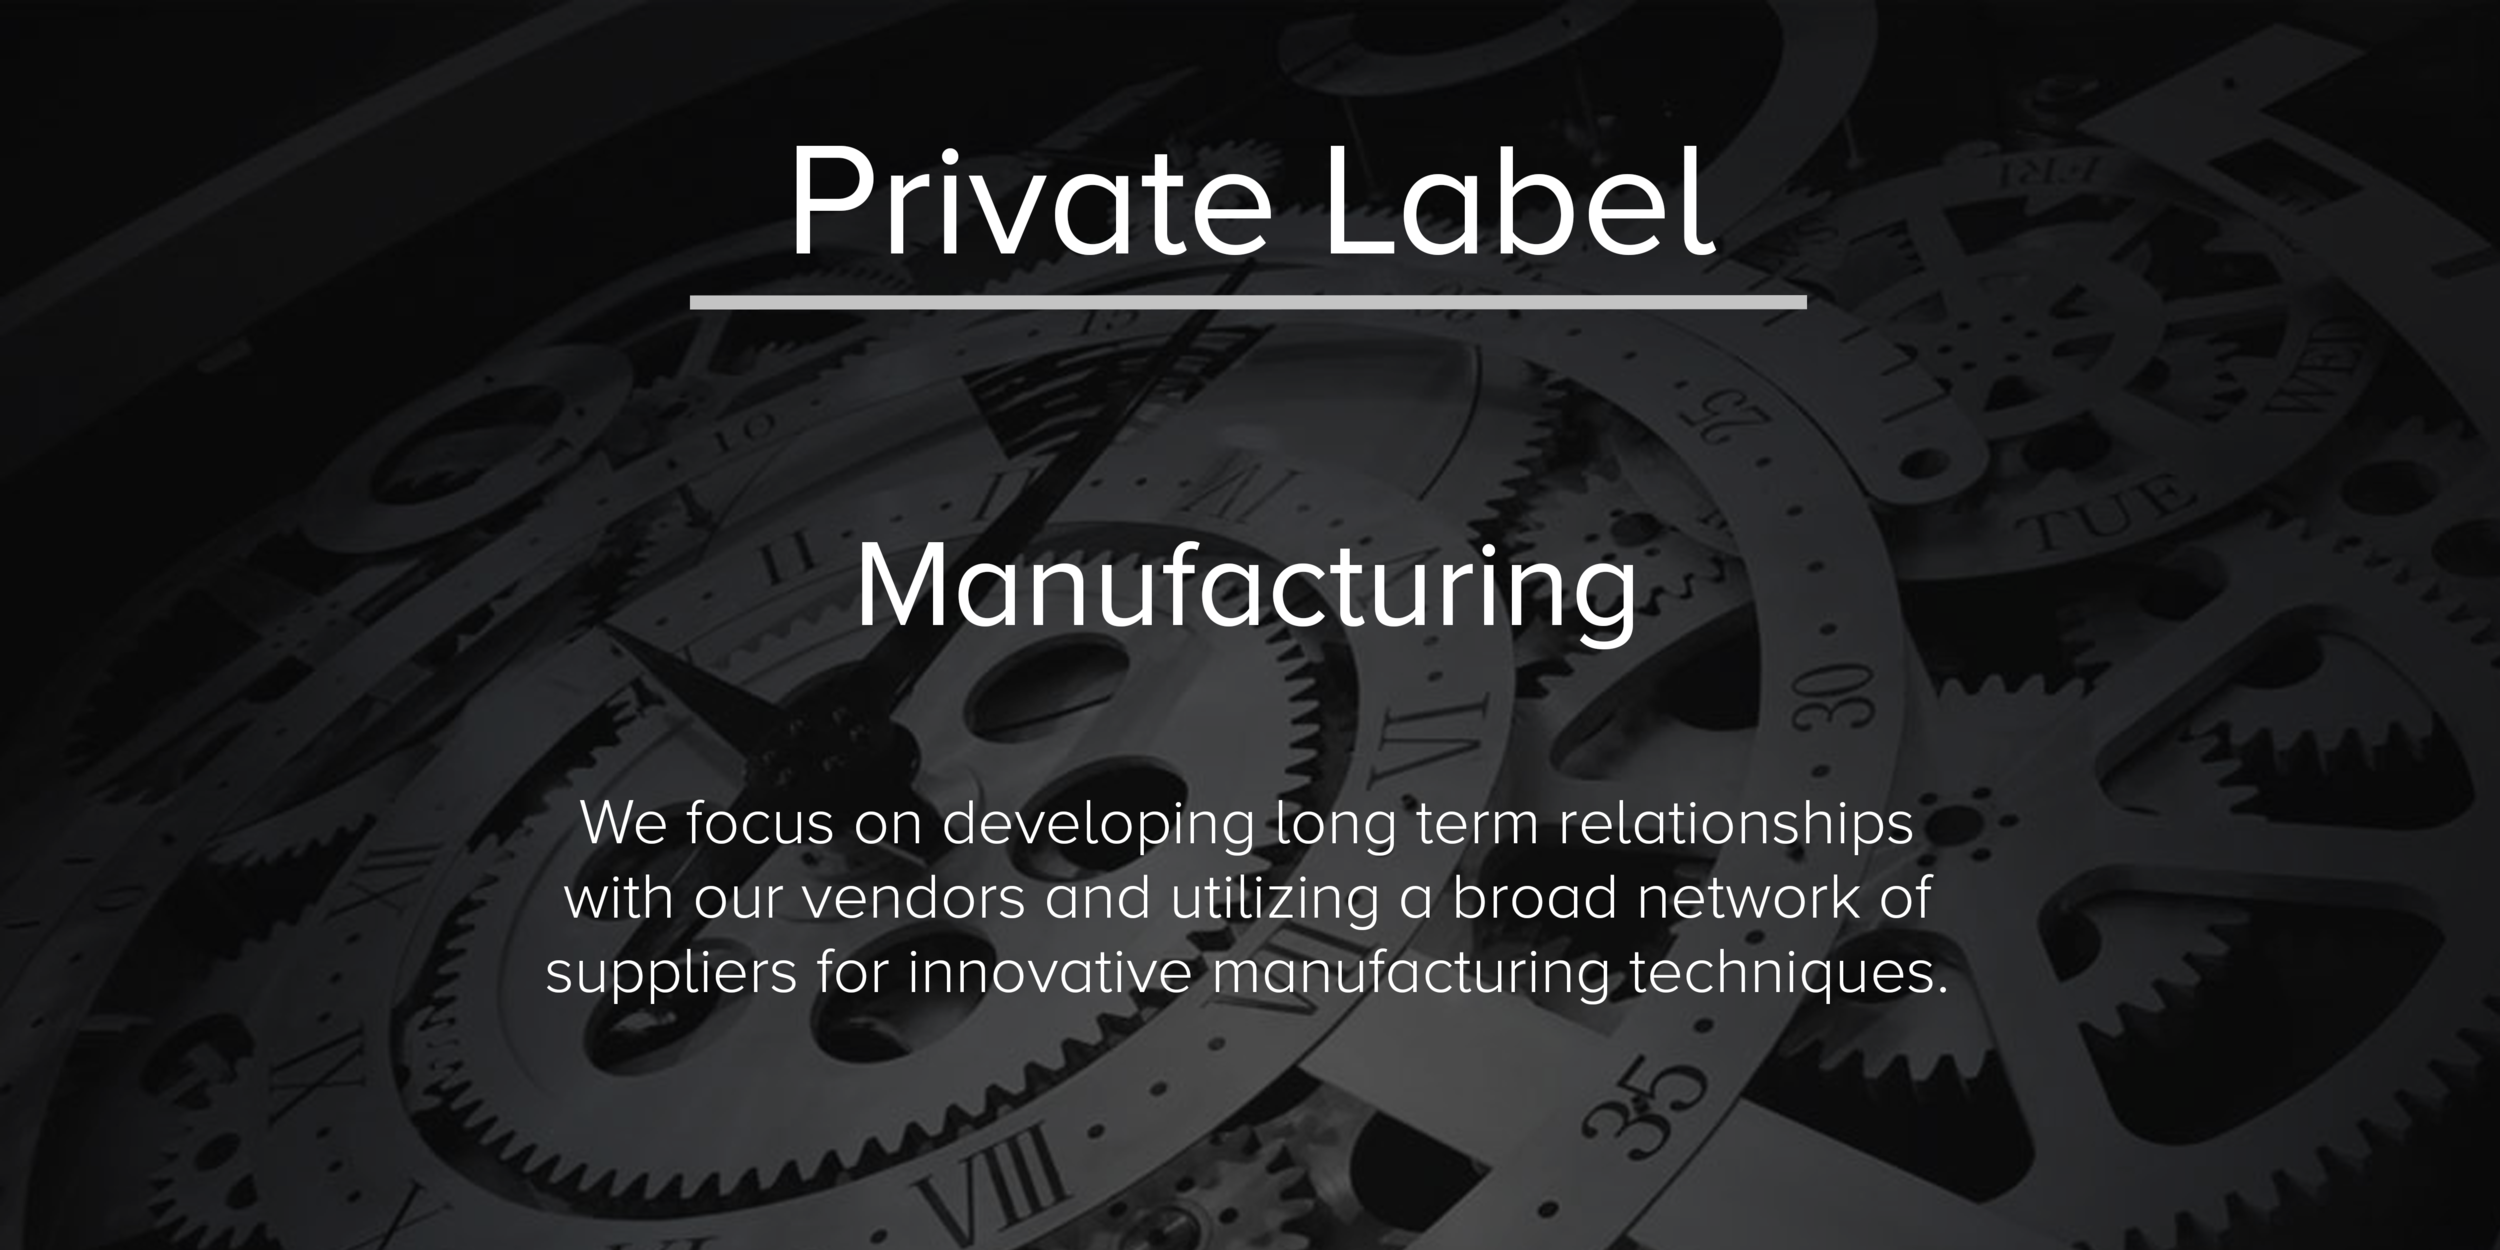 manufacturing-pl.png